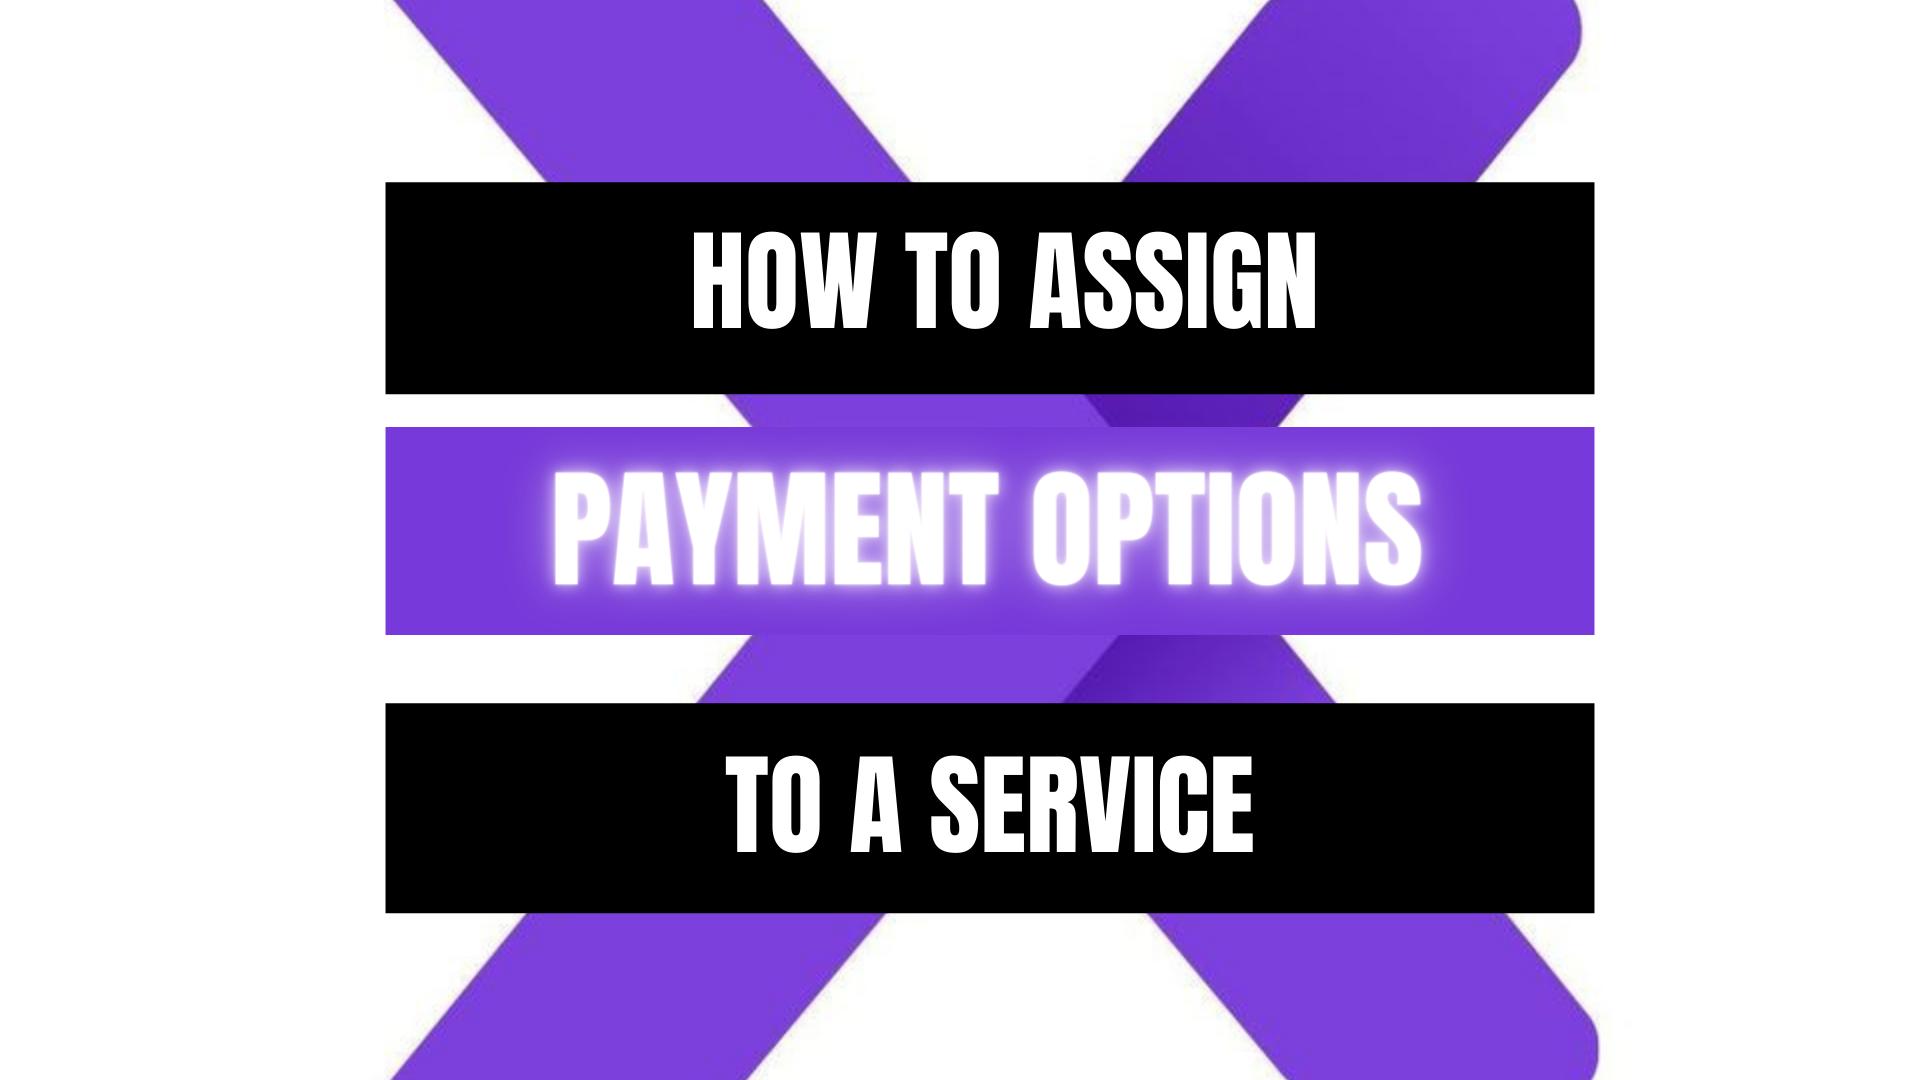 Peekaboox - Service Payment Options